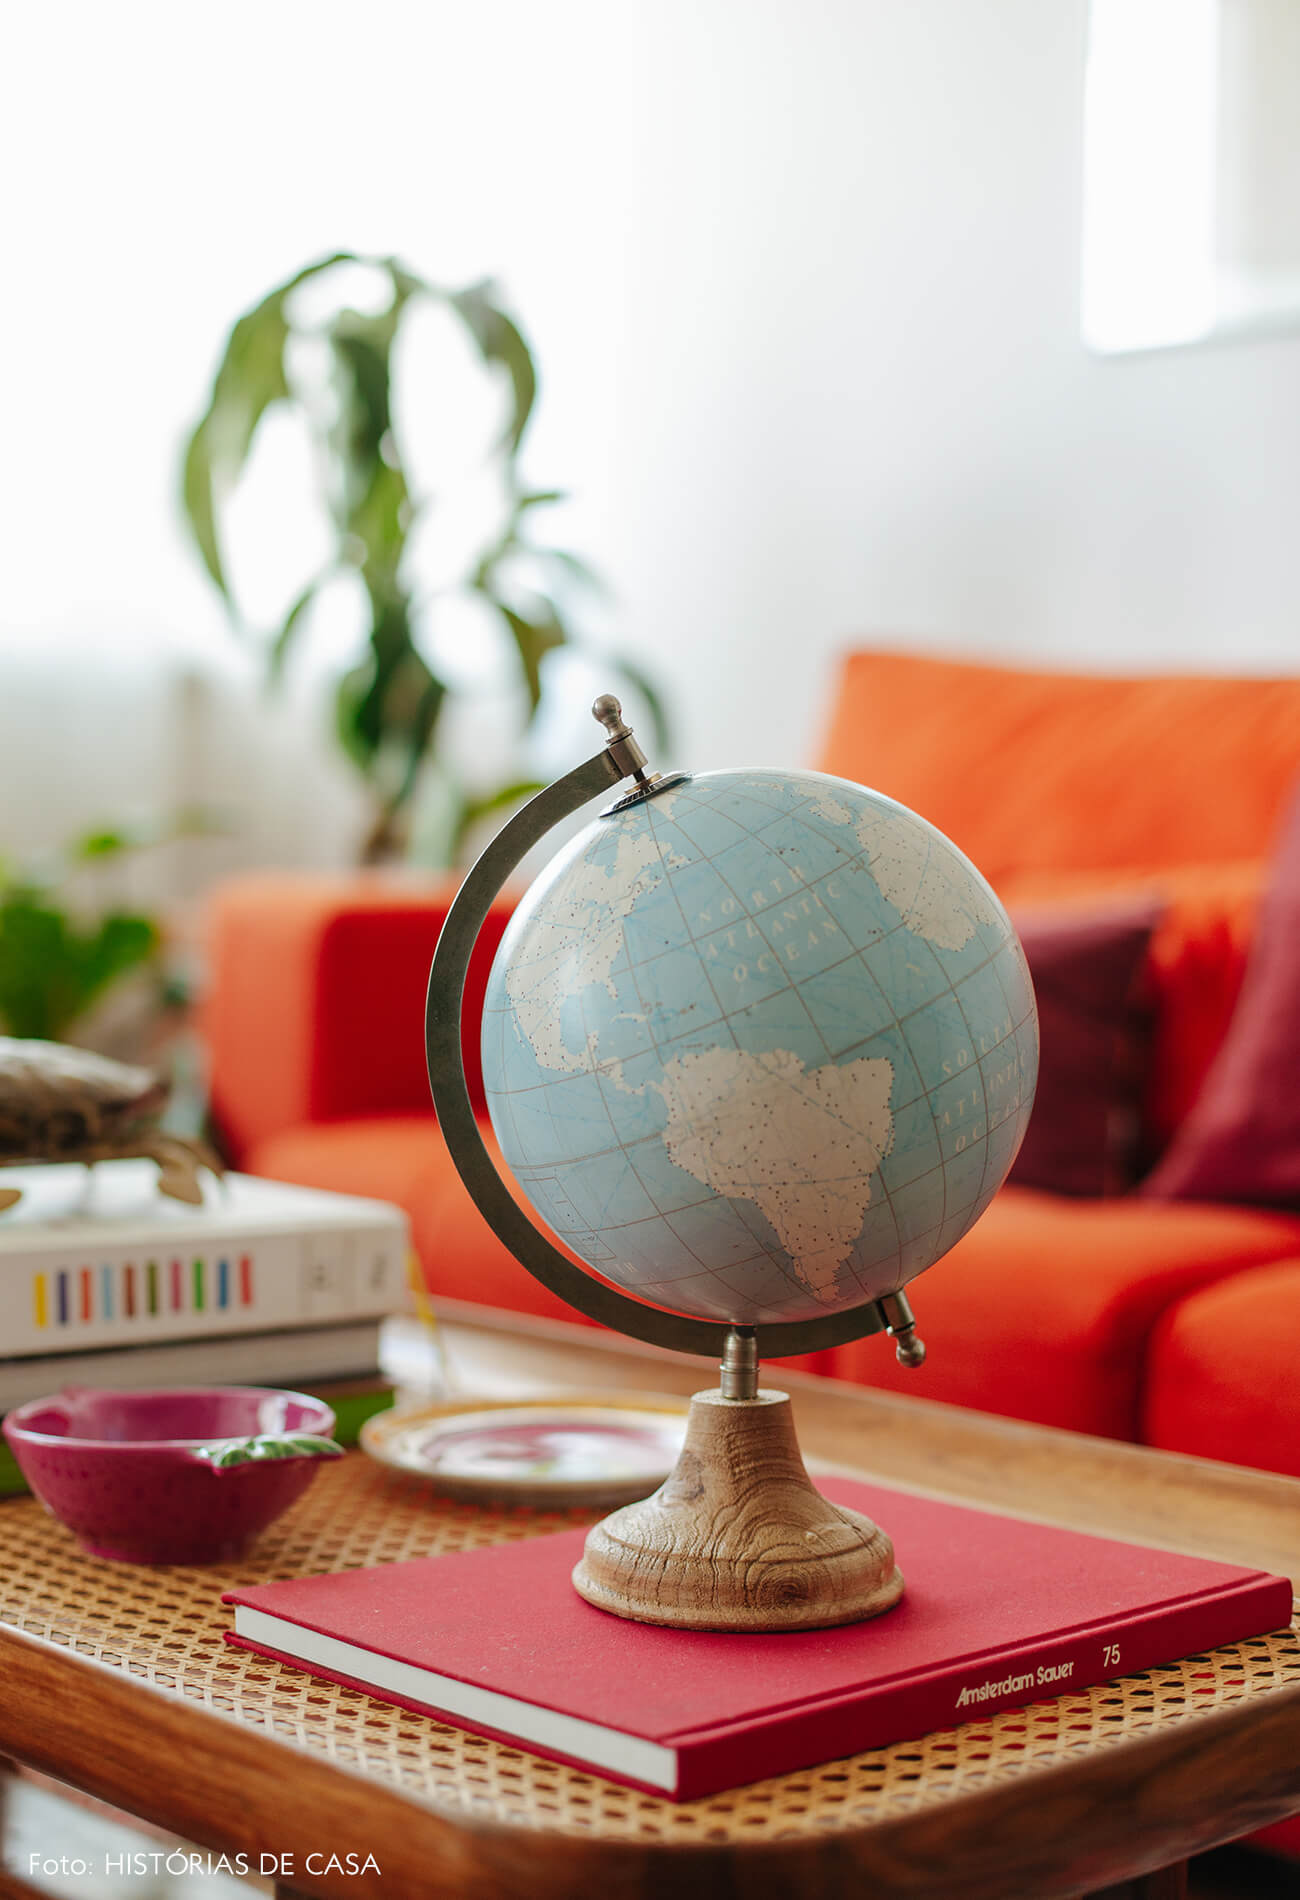 Apartamento chef Renata Vanzetto, móveis coloridos